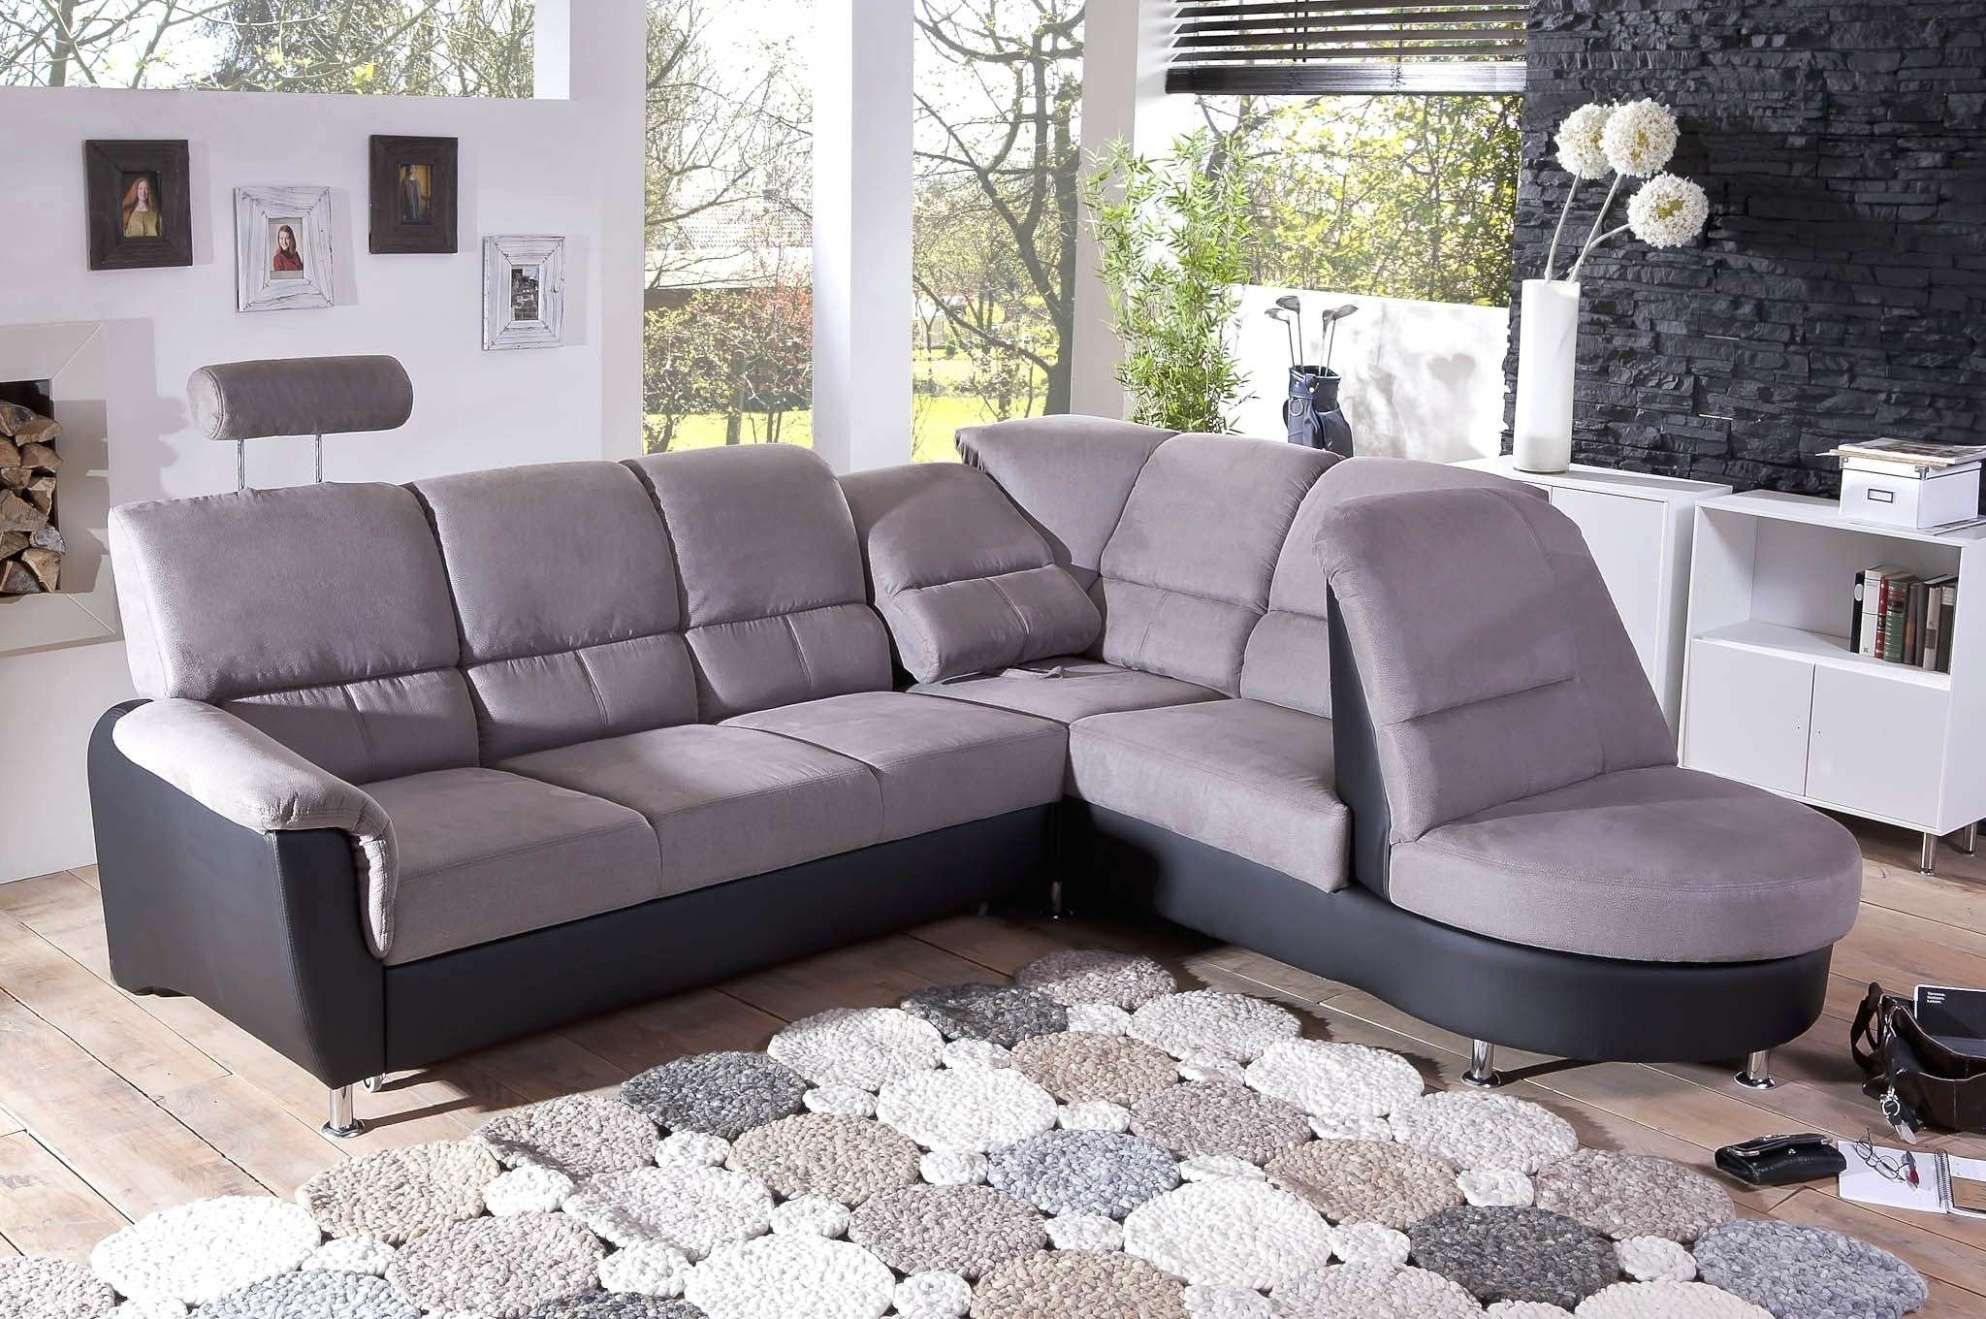 Ecksofa Kaufen Günstig Ecksofa Leder Günstig Yct Projekte Home Decor Sofa Design Decor